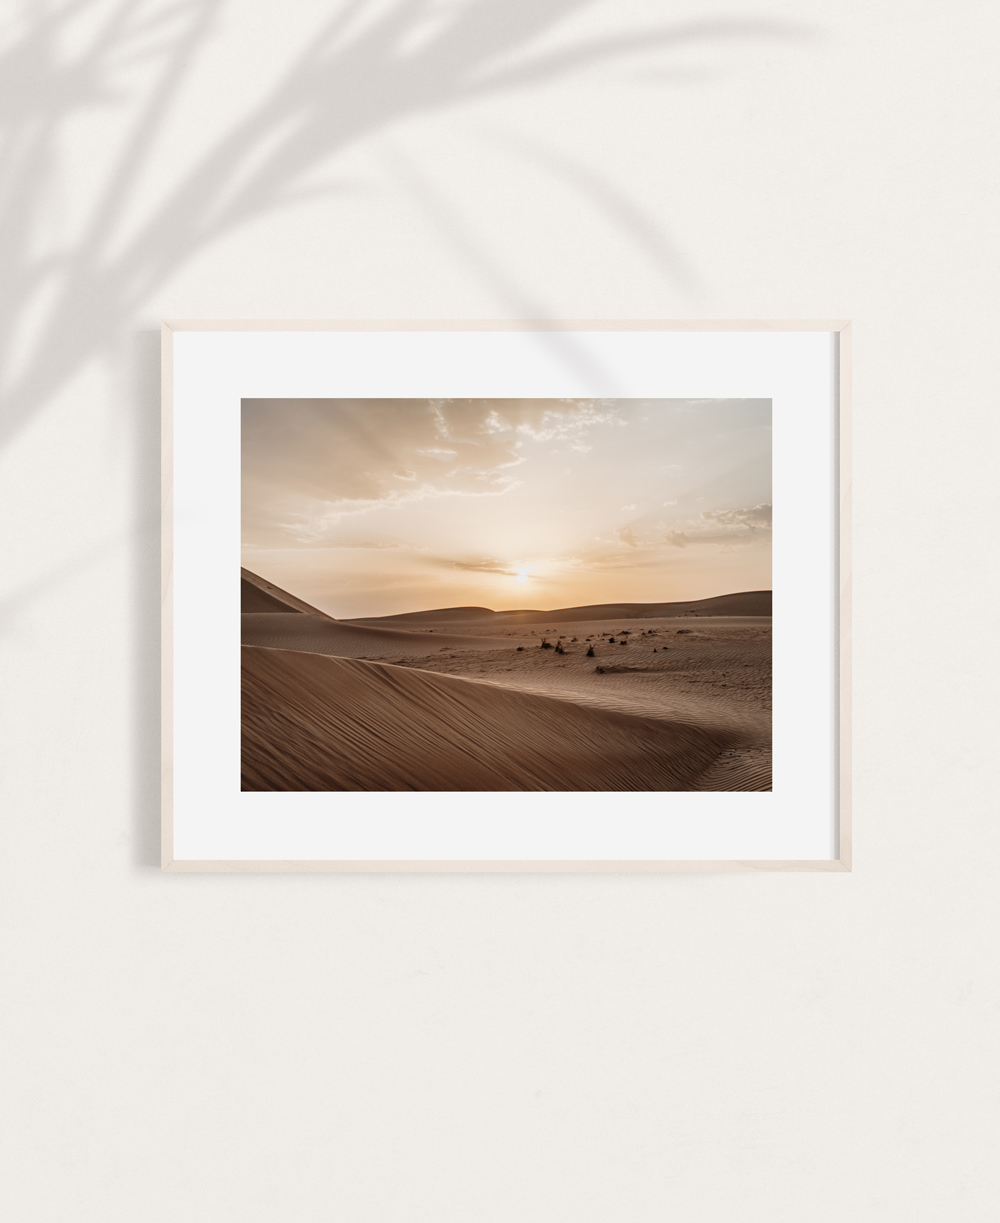 nicischwab-prints-010-oman dessert